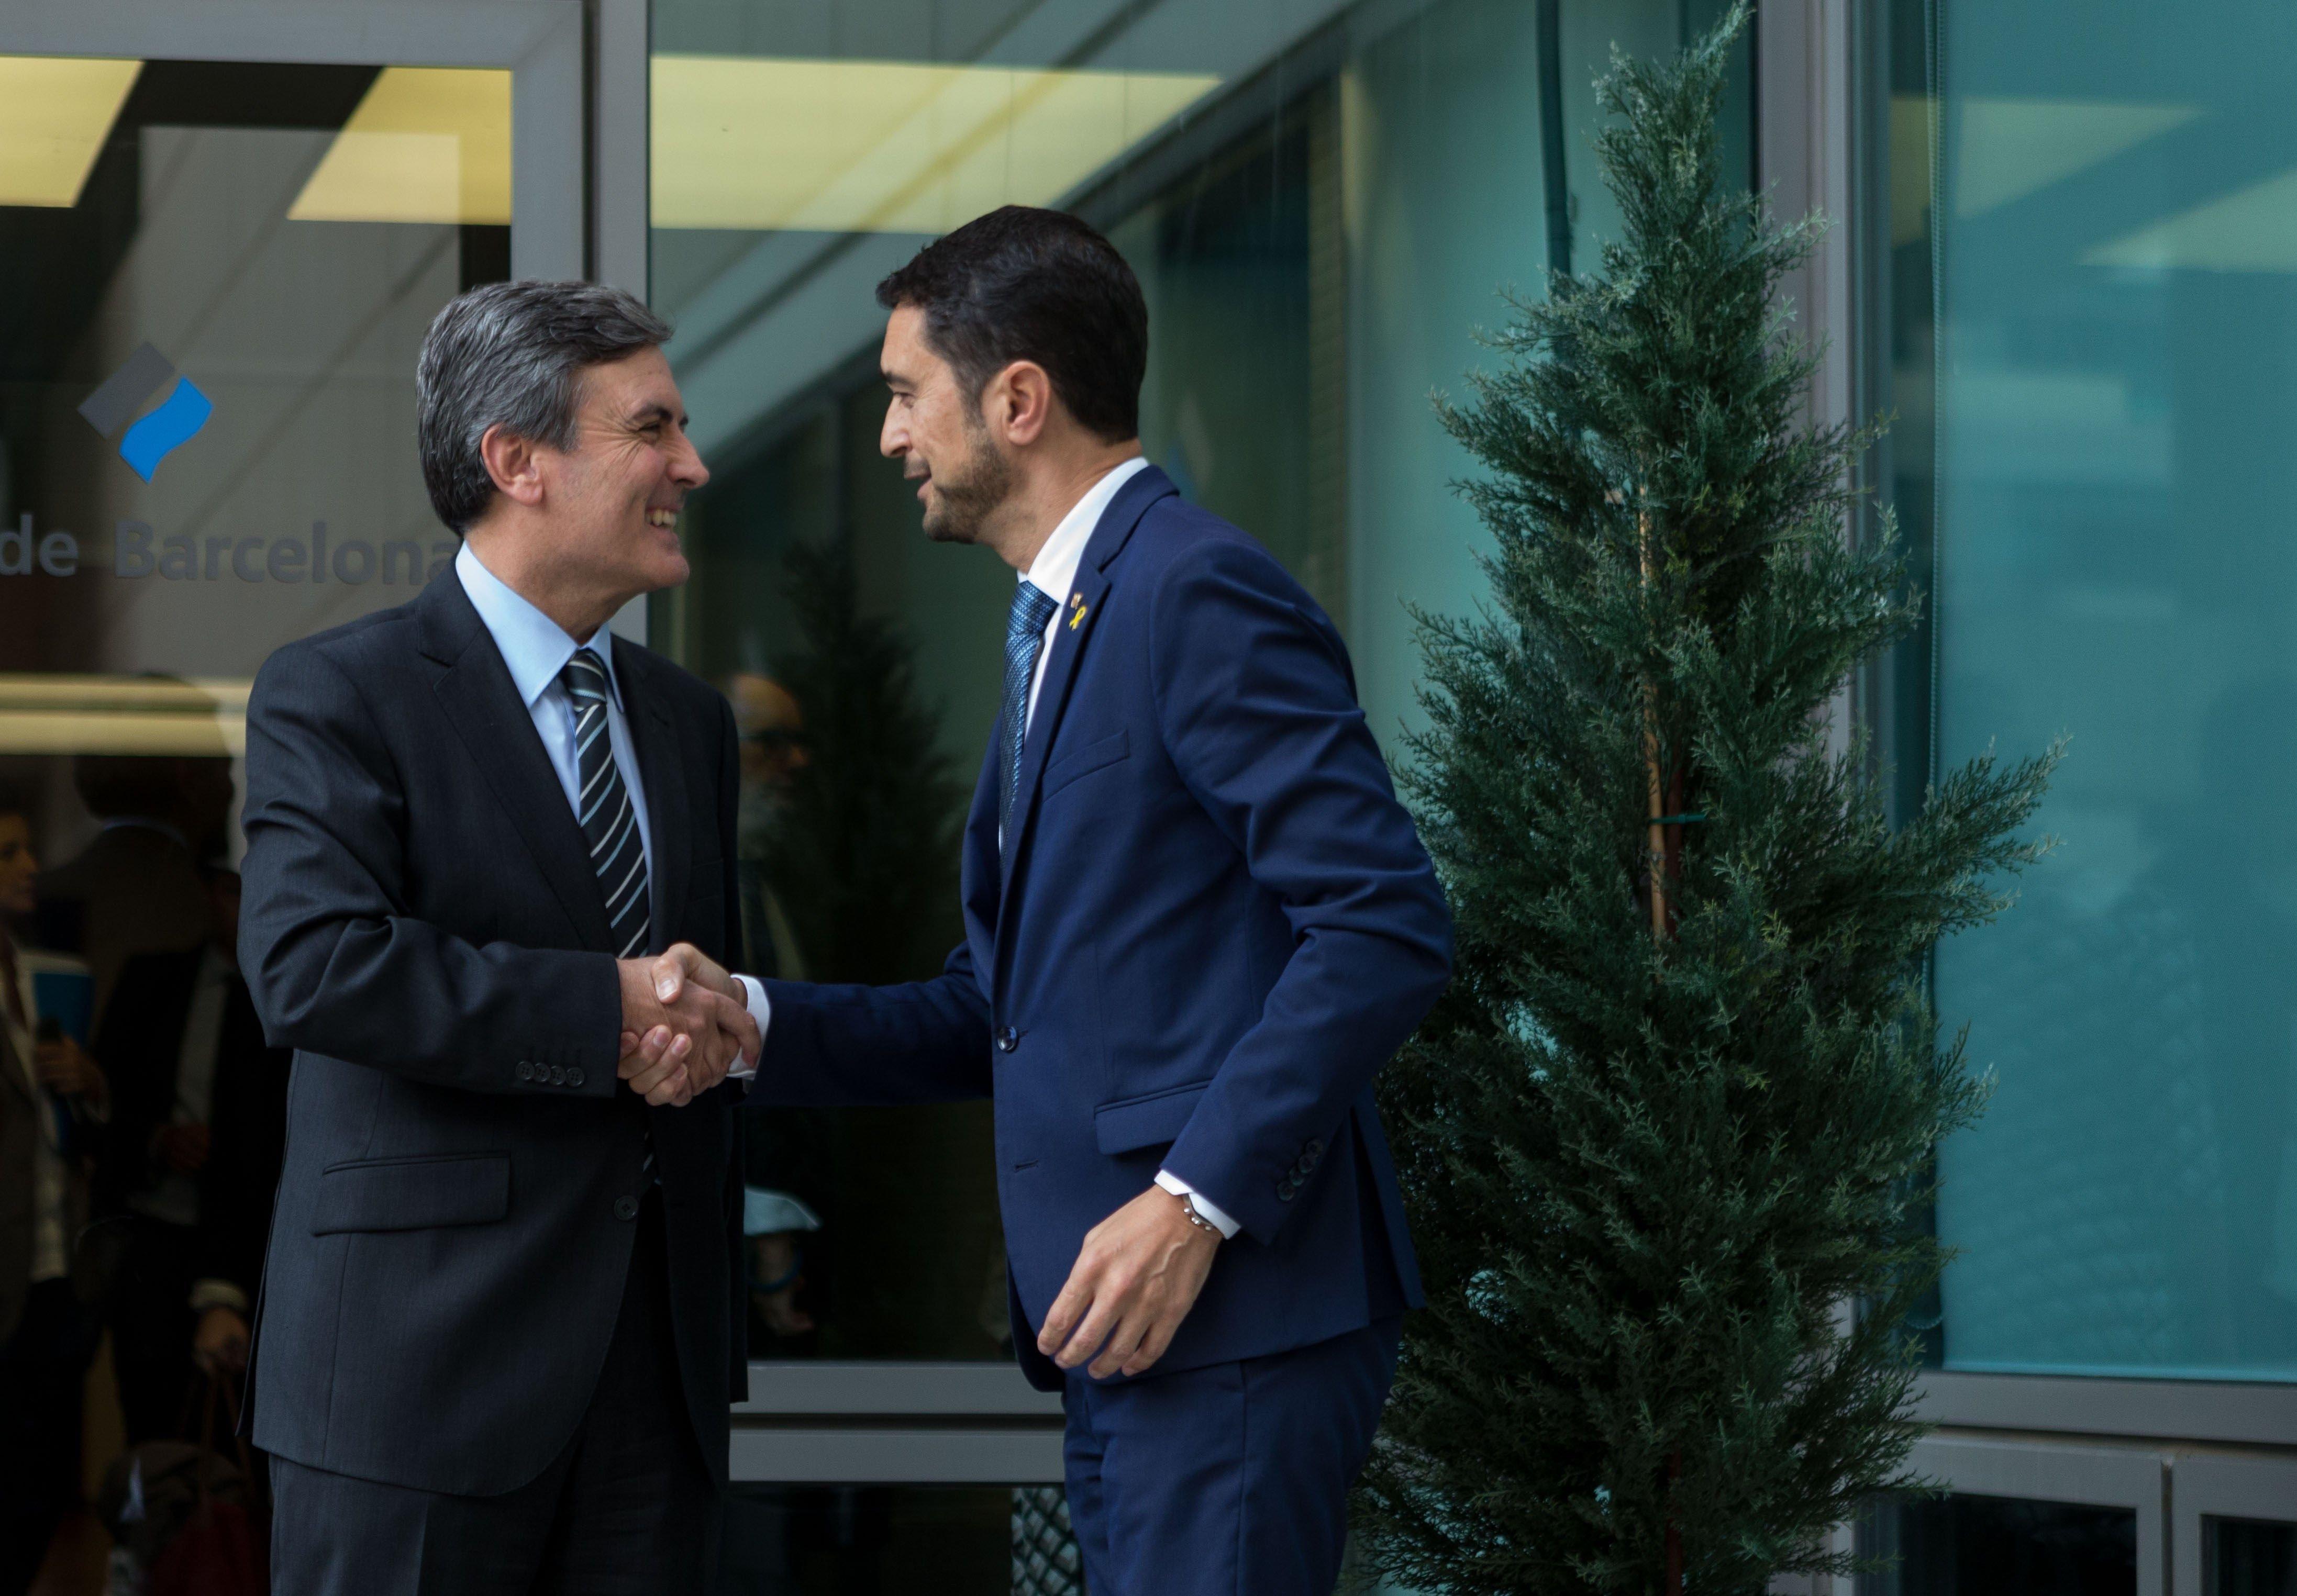 Sánchez's first broken promise: 200 million euros for Catalan infrastructure delayed